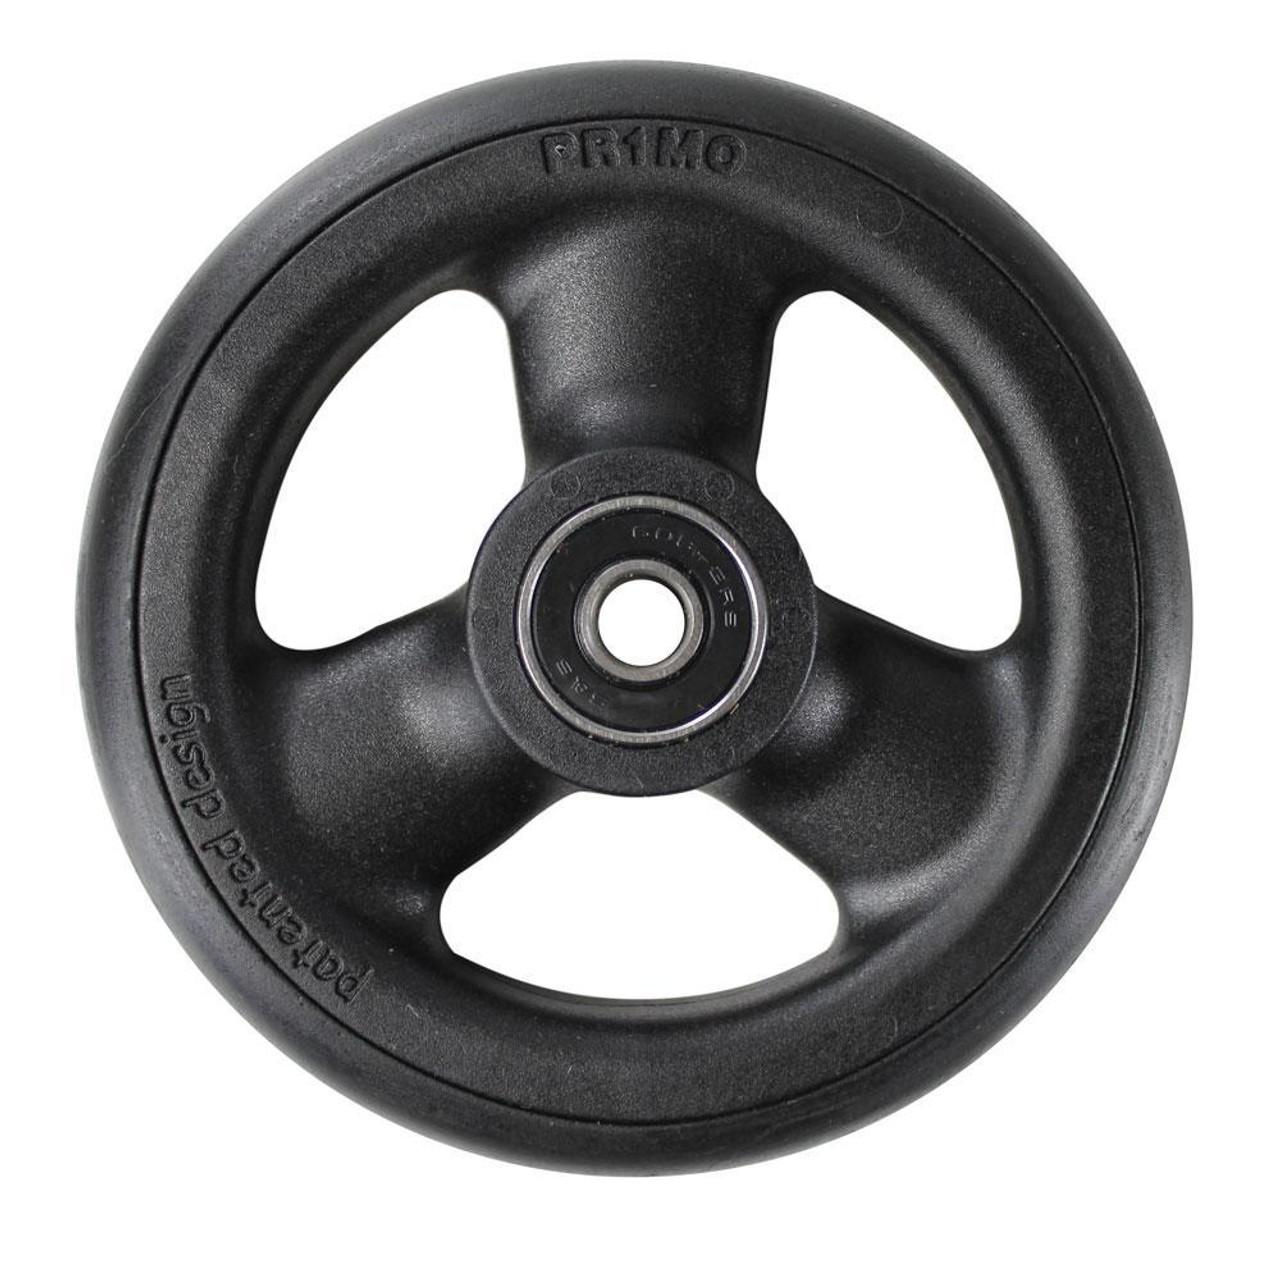 "4 x 1"" HOLLOW SPOKE Caster Wheel Urethane Round Tire"